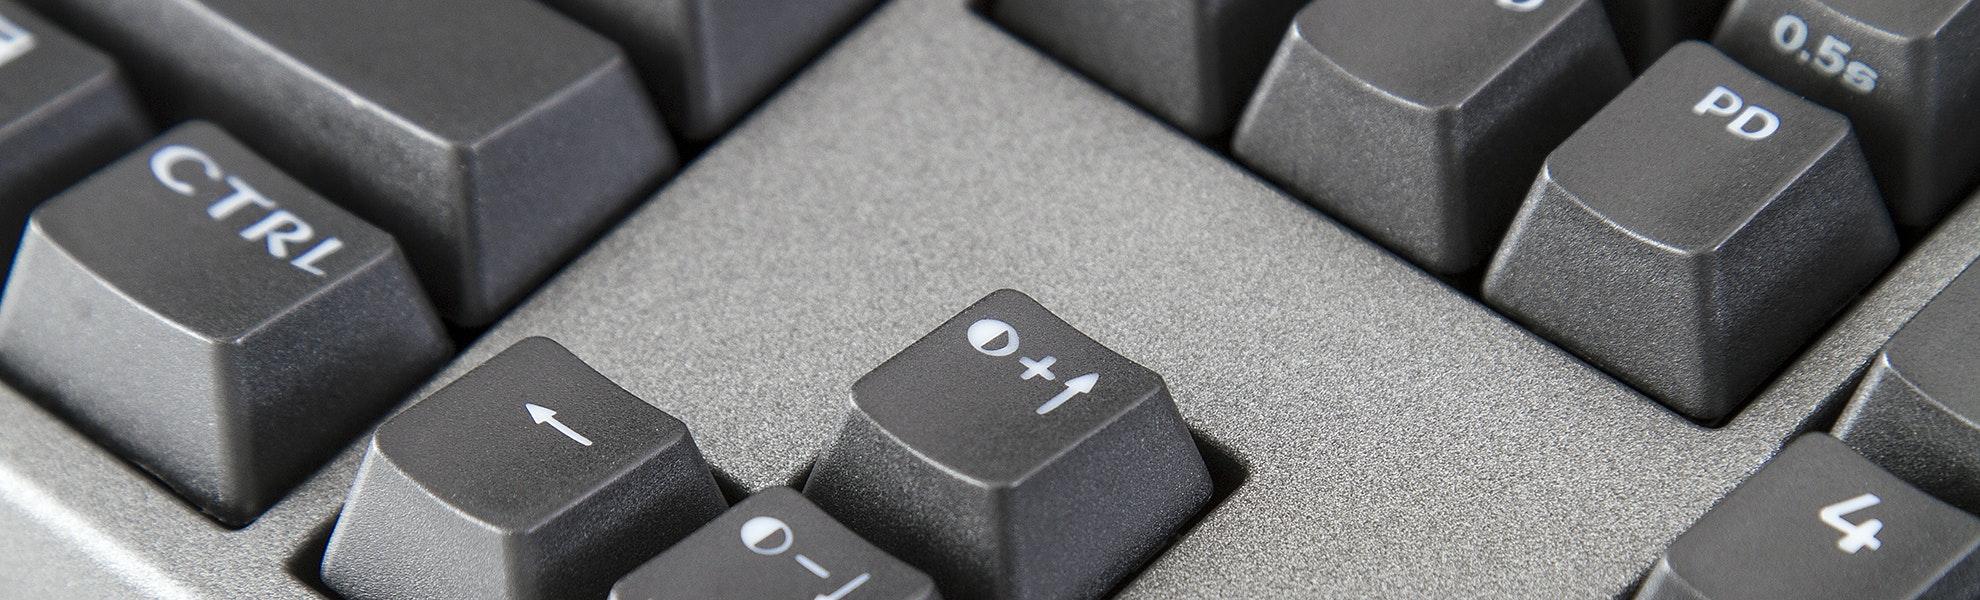 Deck 108 Hassium Pro Mechanical Keyboard